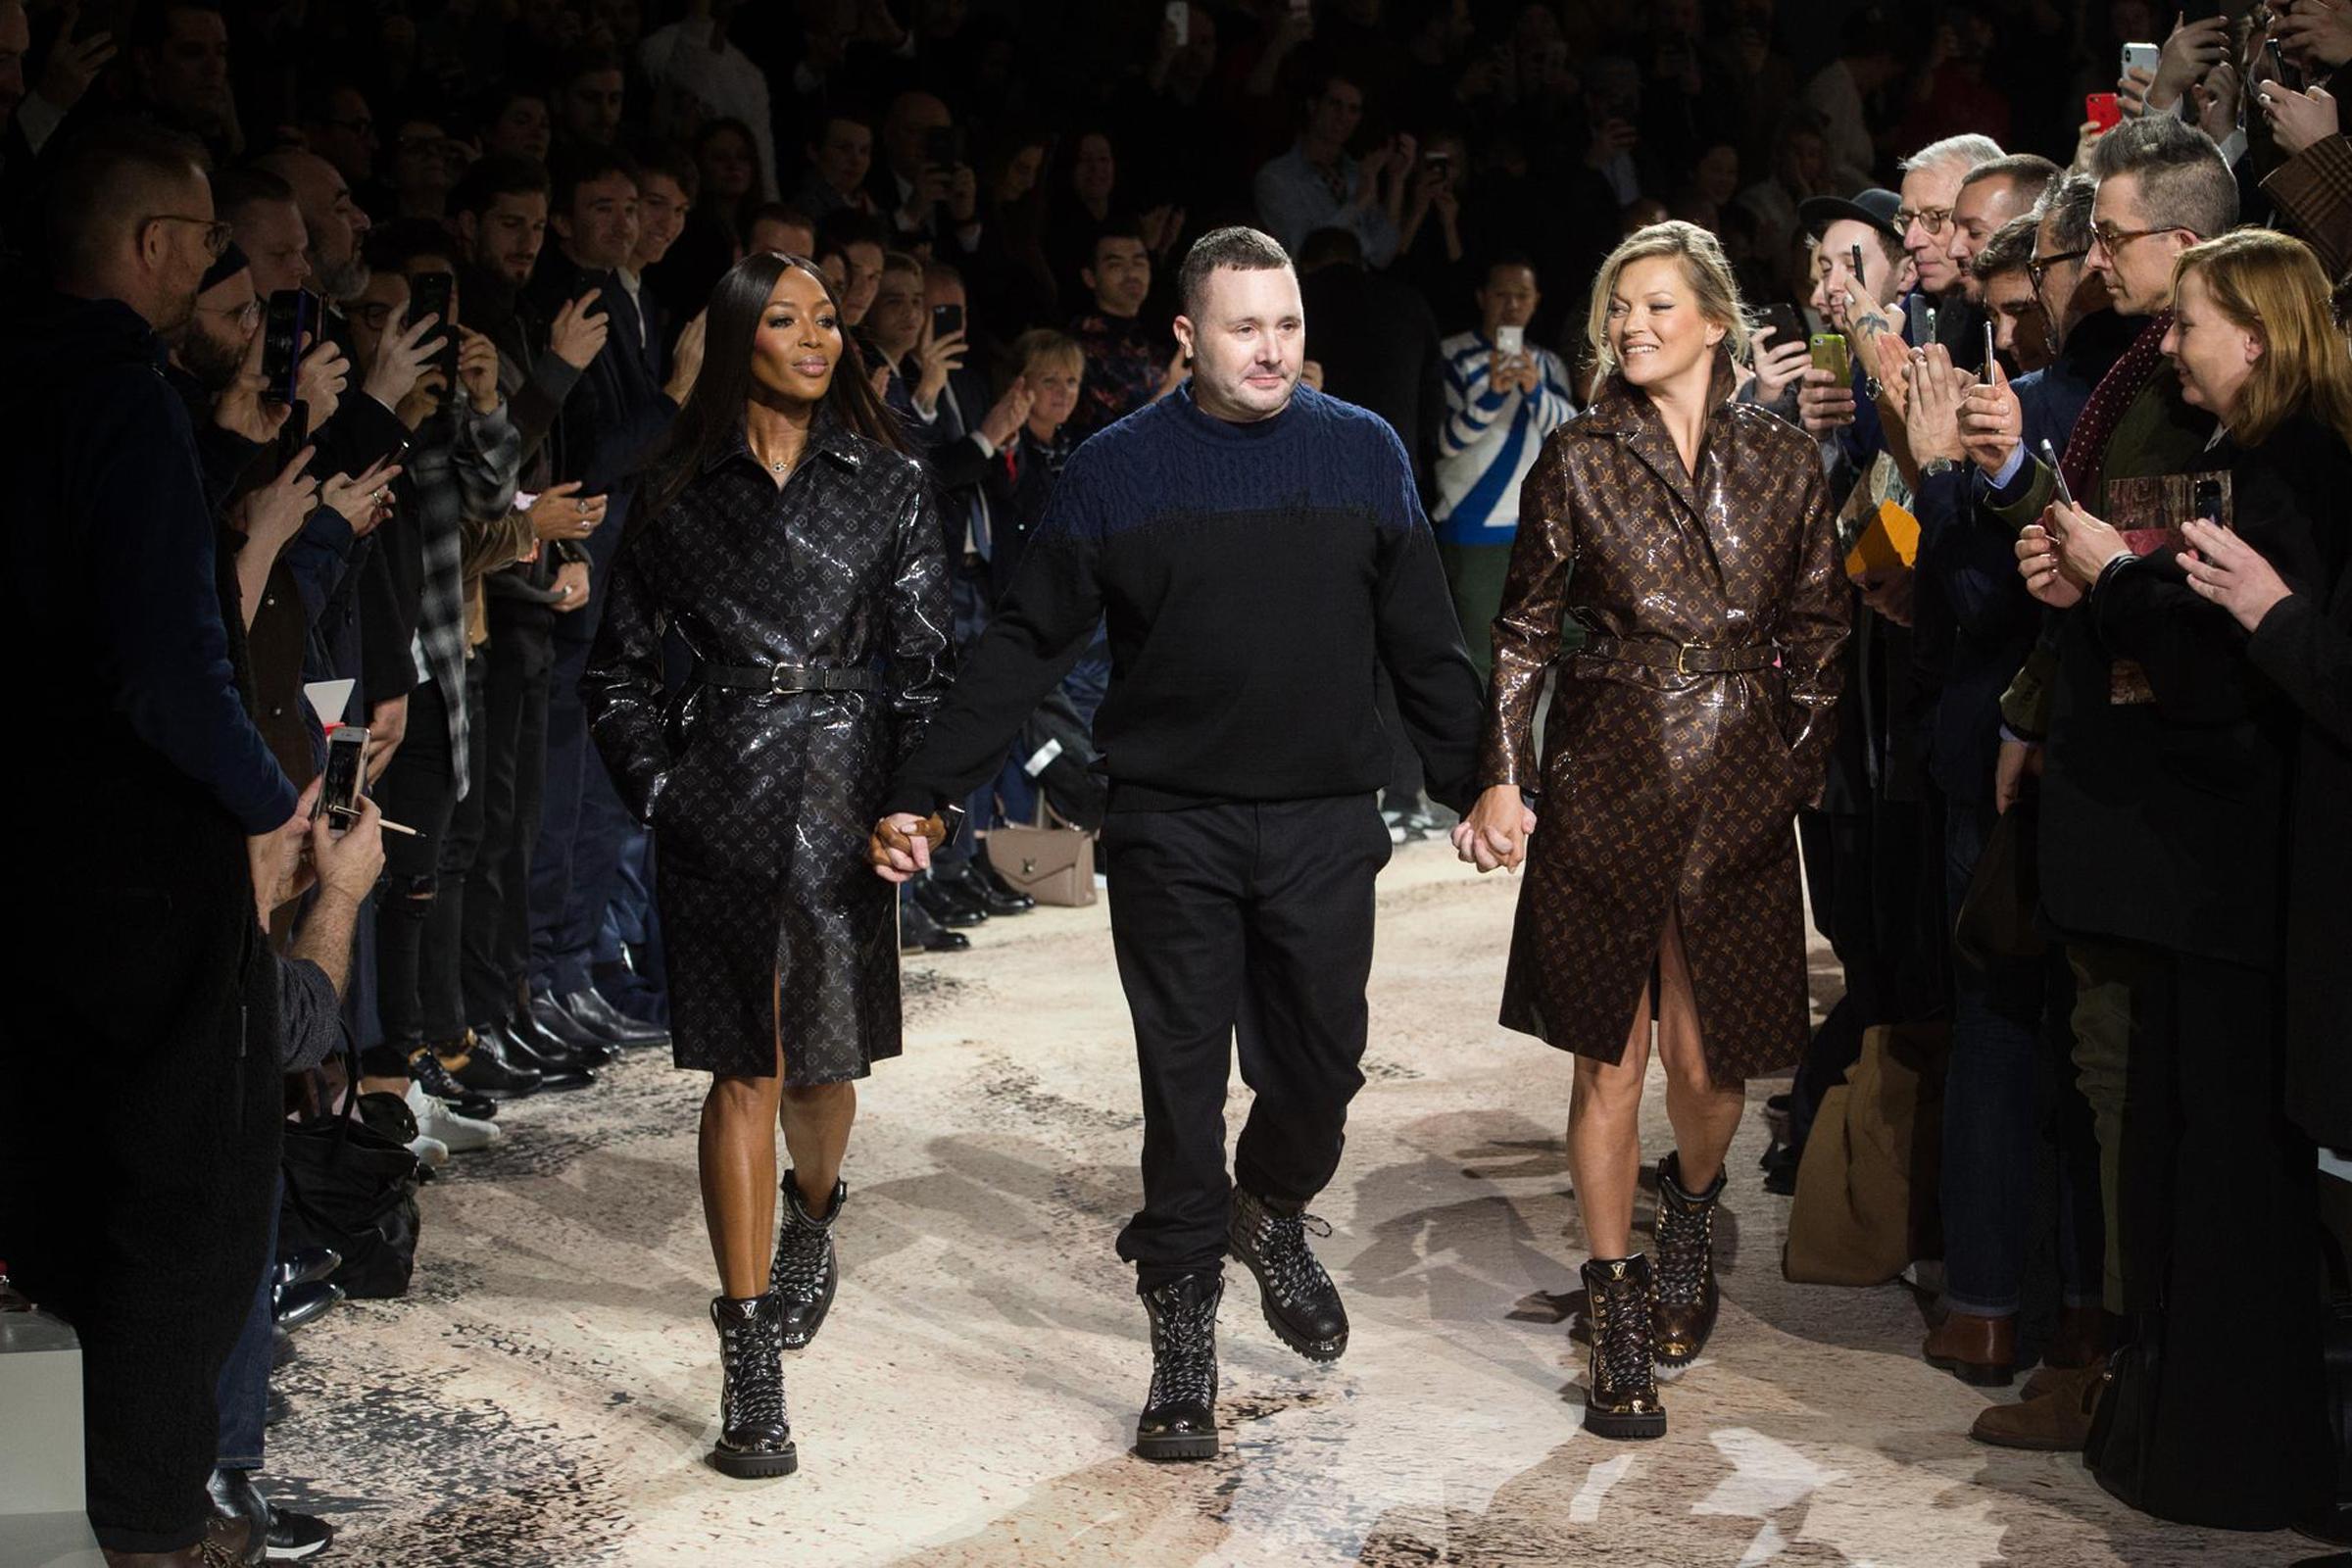 d63fdb16b29e Ranking Every Kim Jones Collection for Louis Vuitton - Kim Jones Louis  Vuitton Collections History Ranked